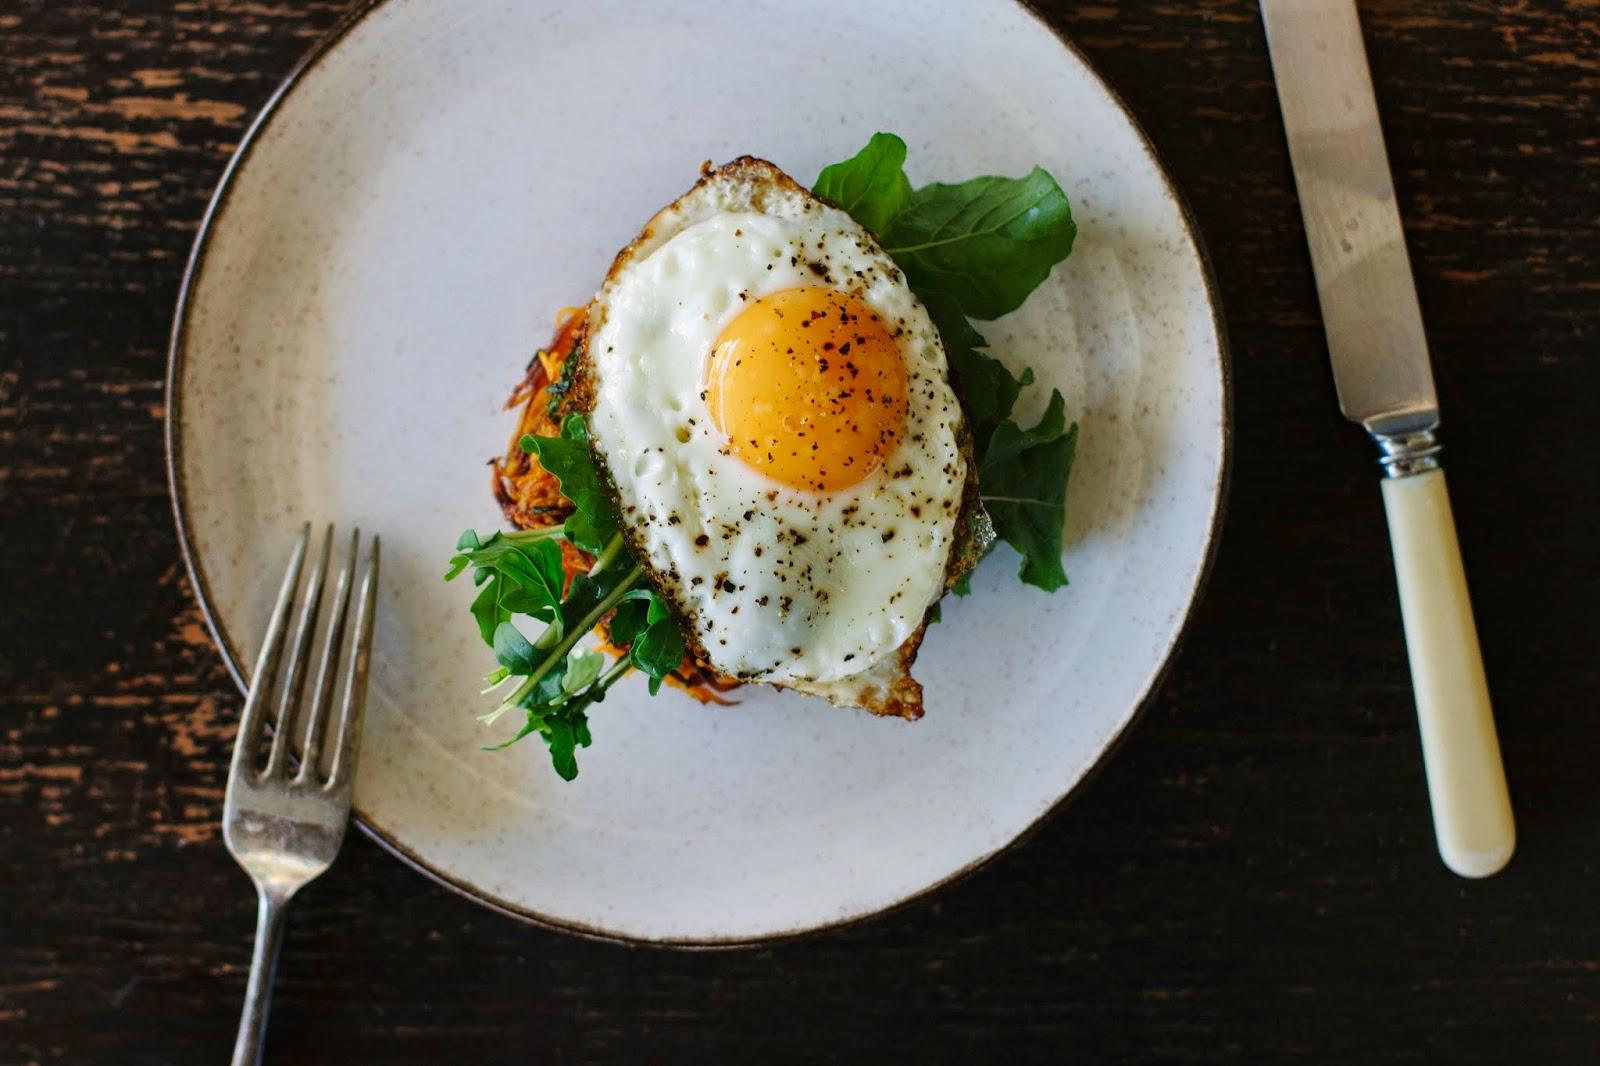 Spiced sweet potato cakes with crispy fried egg recipe + a ...